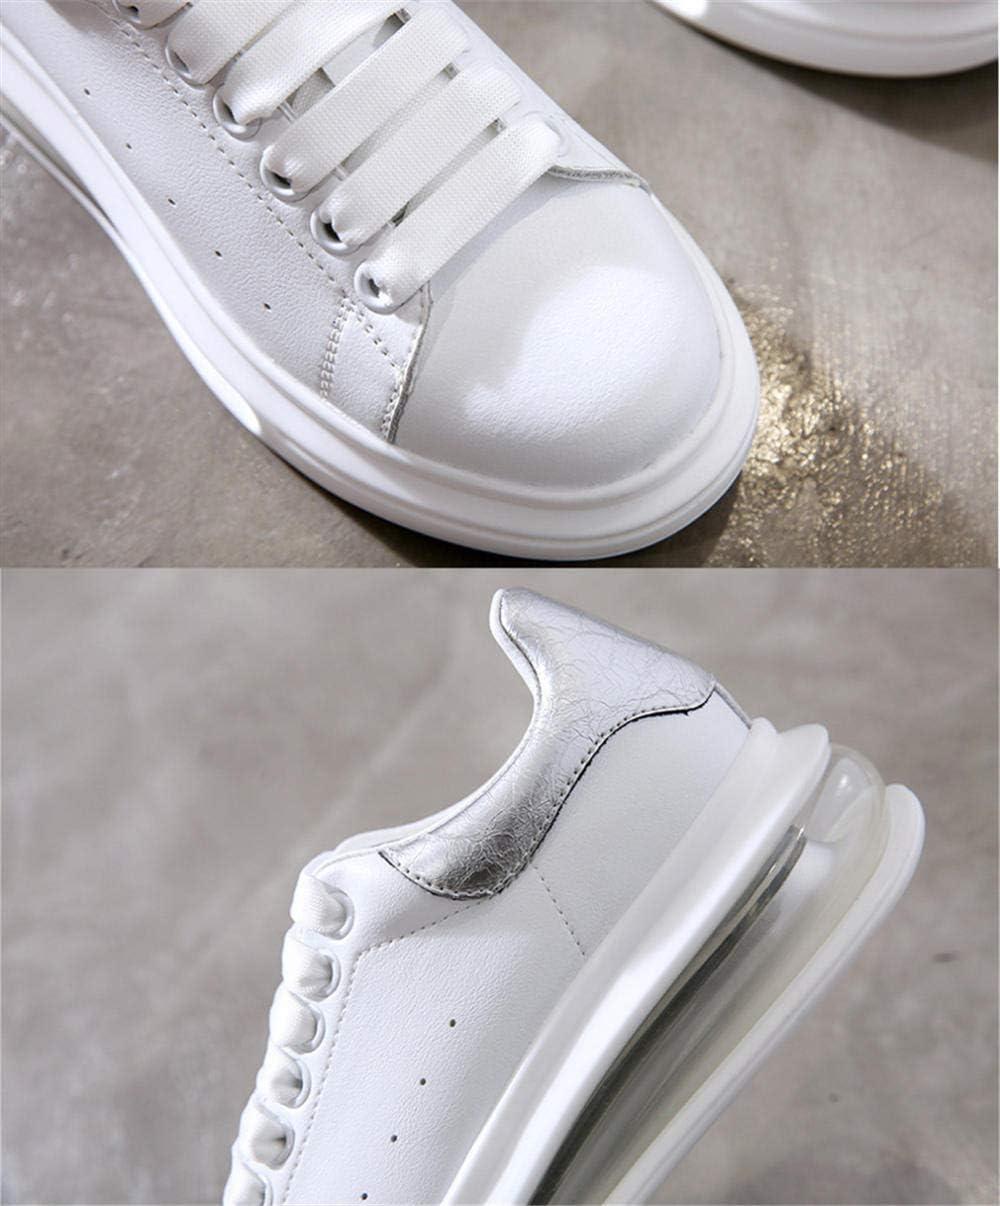 XL_nsxiezi Sneakers Femme en Cuir véritable argent